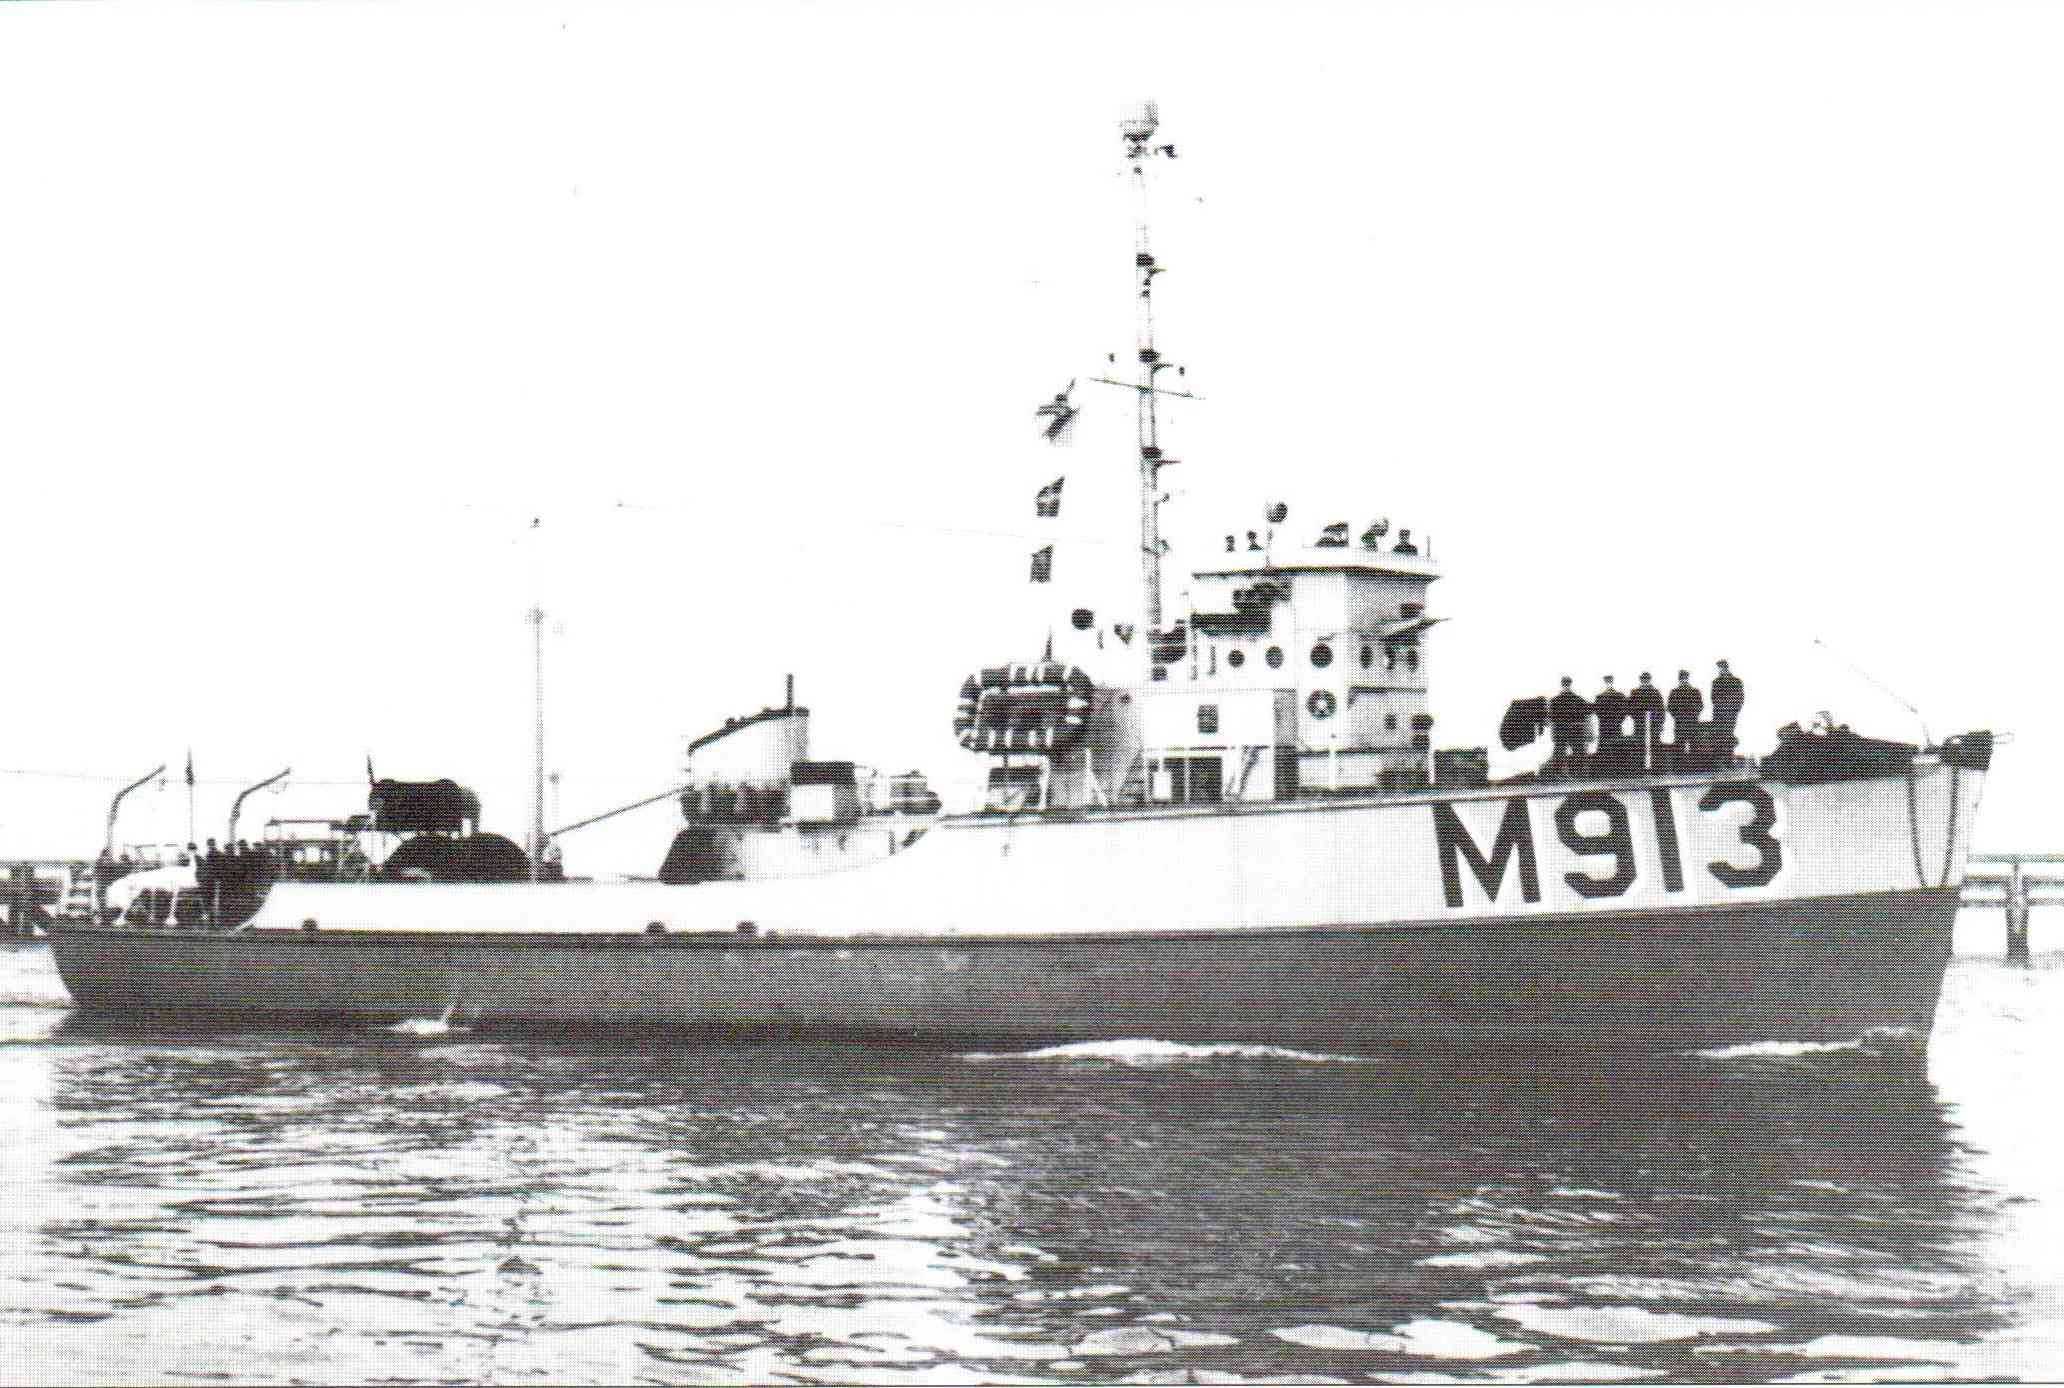 m913_m10.jpg